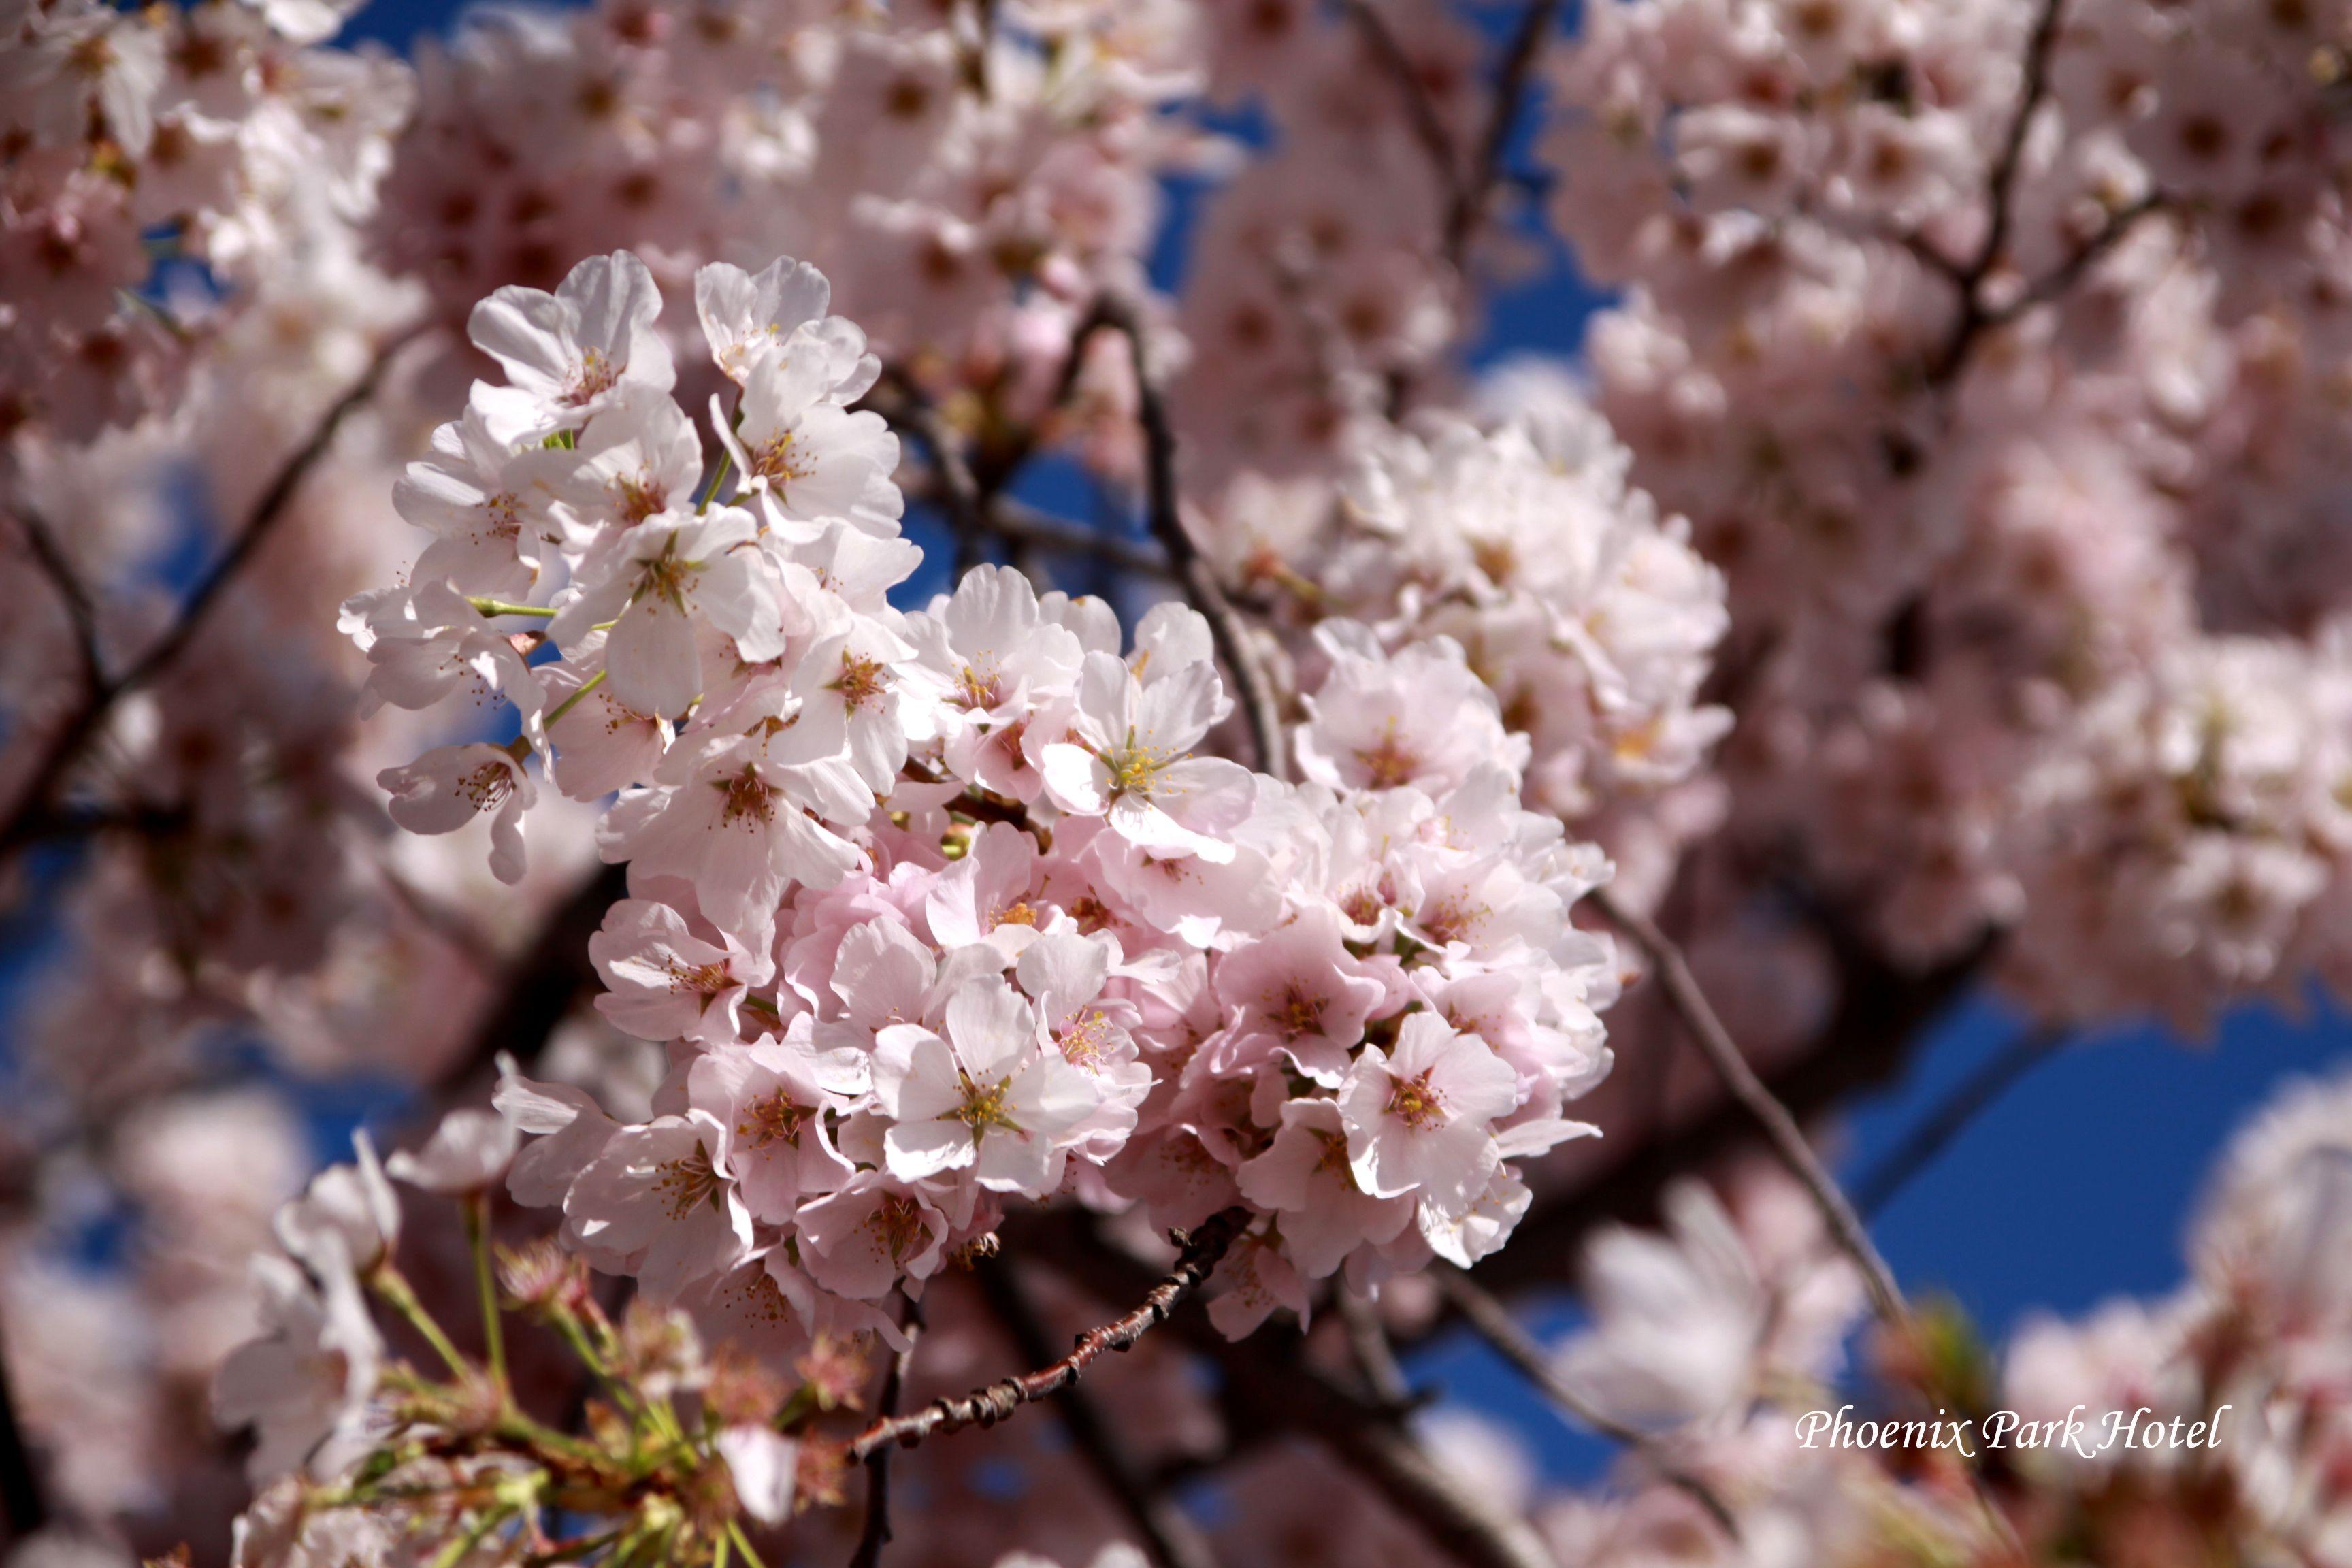 Cherryblossom Washingtondc Phoenixparkhotel Cherry Blossom Sepcial With Handmade Paper Tre Cherry Blossom Dc Cherry Blossom Festival Cherry Blossom Tree